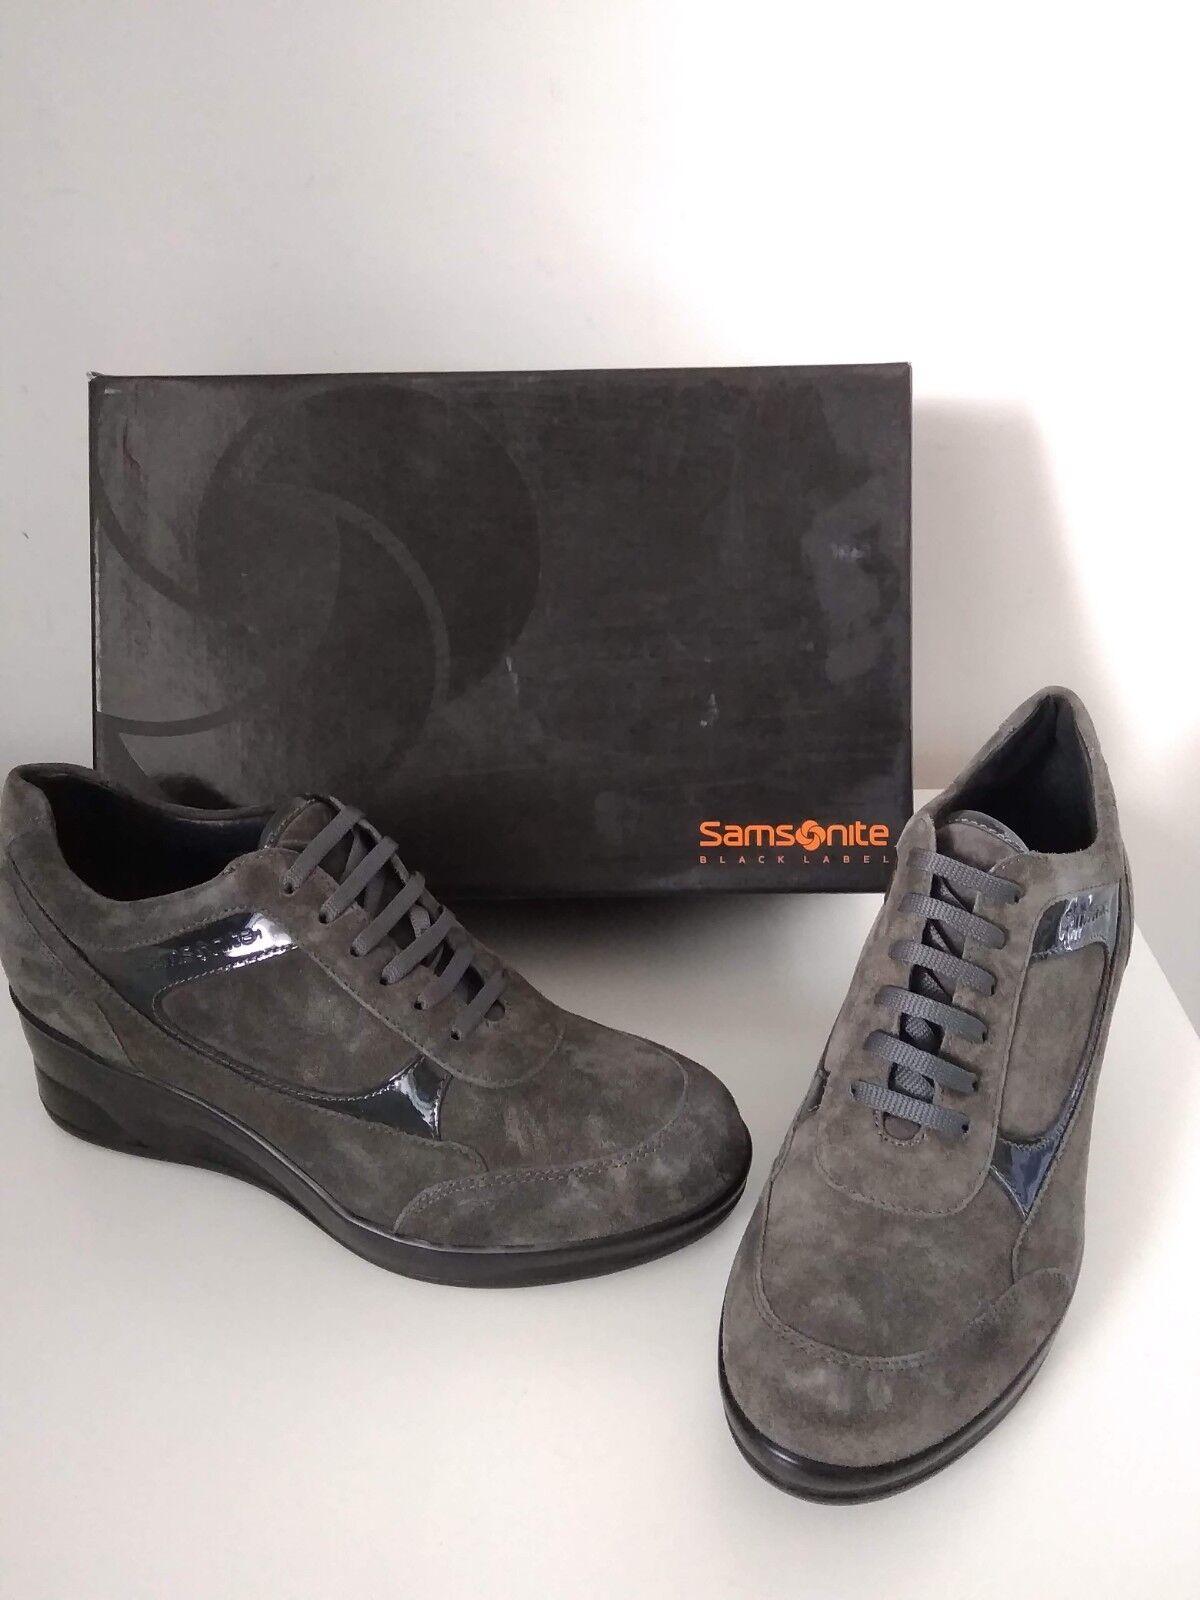 SNEAKERS DONNA N.38 SAMSONITE CAMOSCIO N.38 GRIGIA N.38 CAMOSCIO DONNA b1b445   066f18